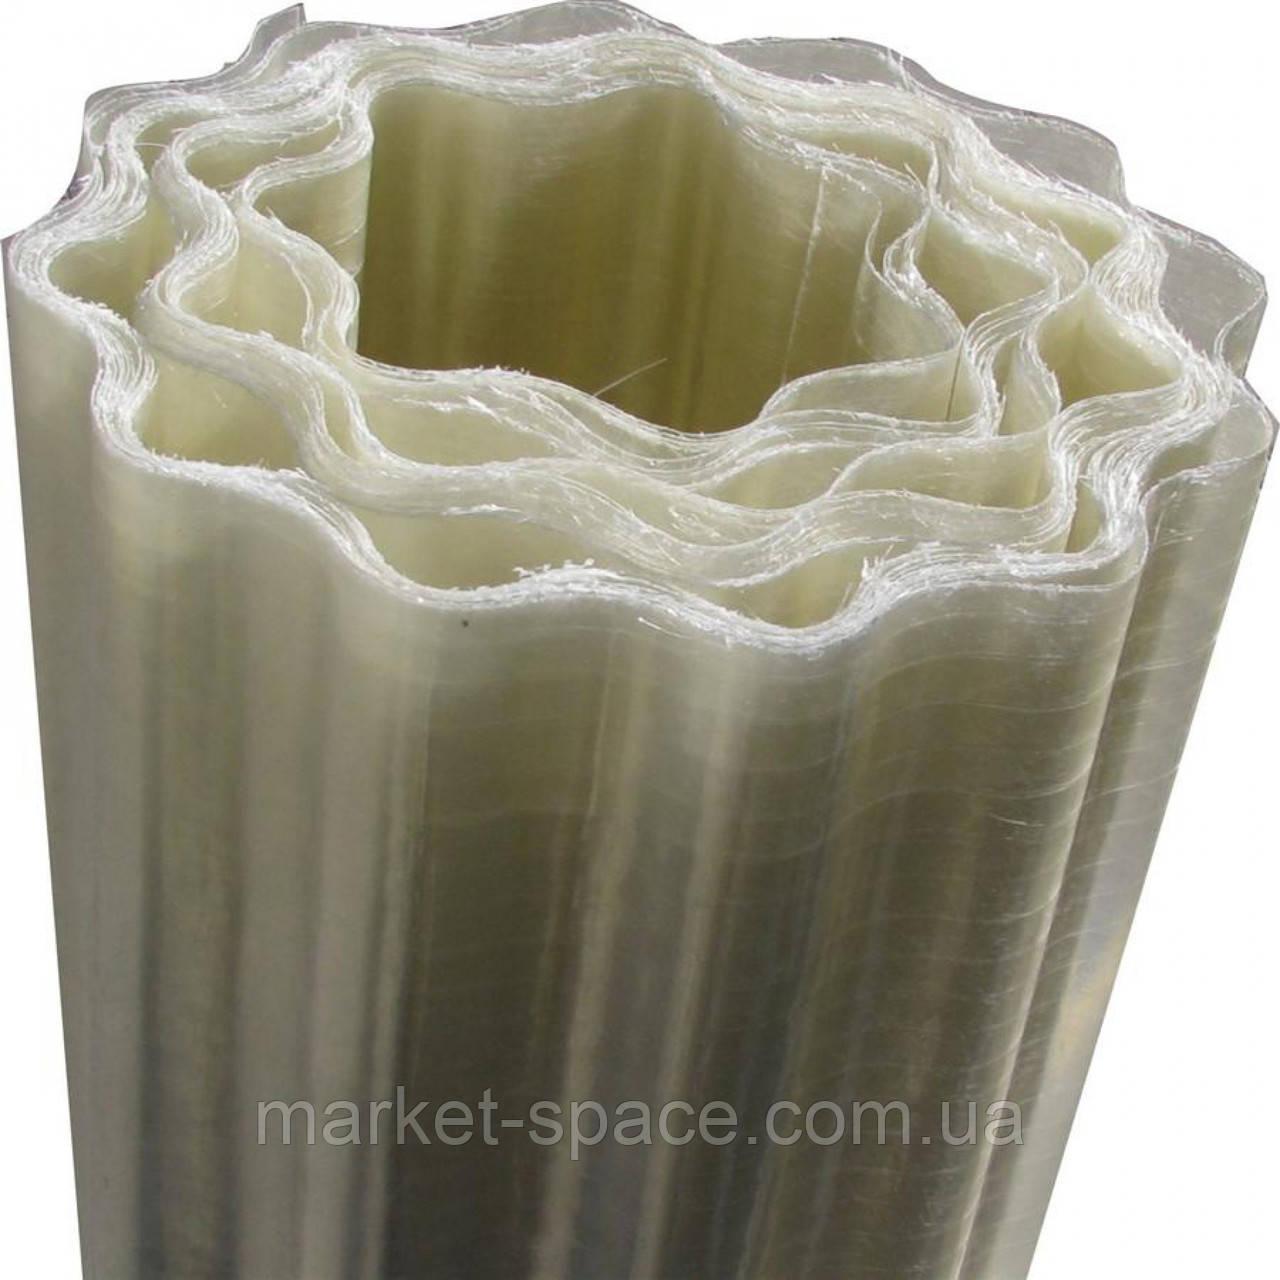 "Пластиковый шифер ""Волнопласт"". Цвет: прозрачный. Размер рулона: Д:21м*Ш:1,5м=31.5 кв.м"